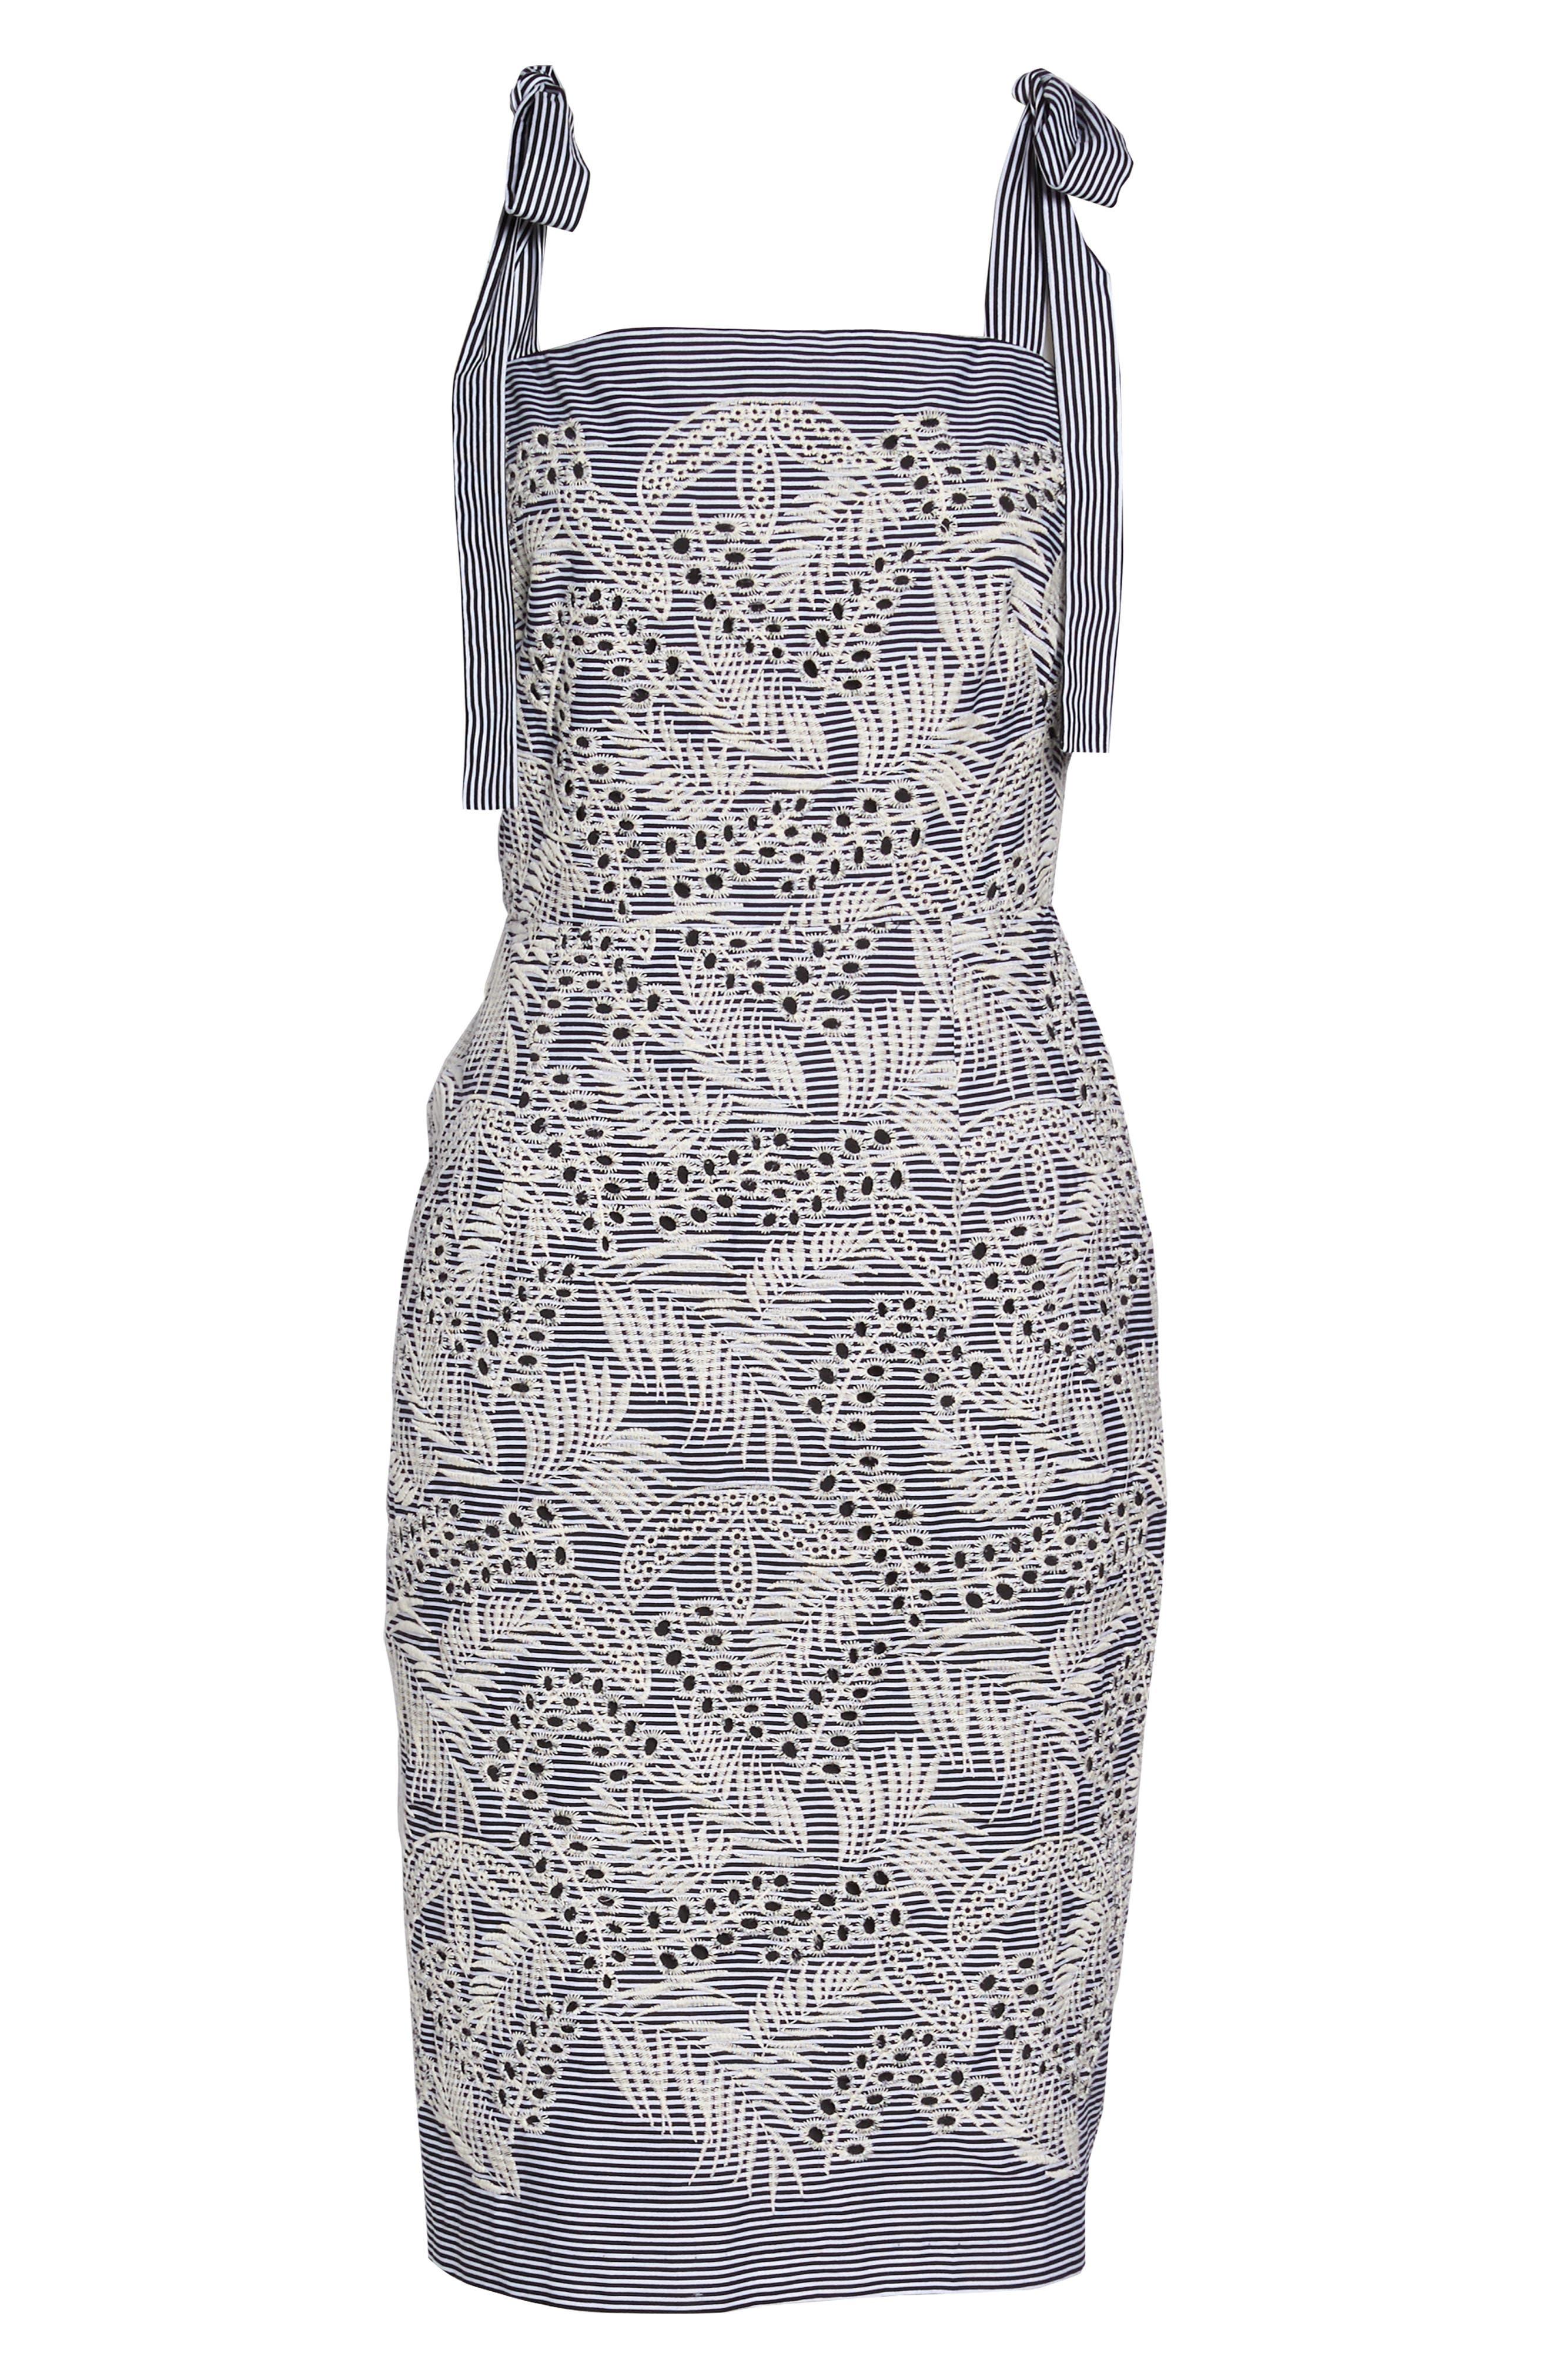 Tie Shoulder Sheath Dress,                             Alternate thumbnail 7, color,                             Black/ Natural